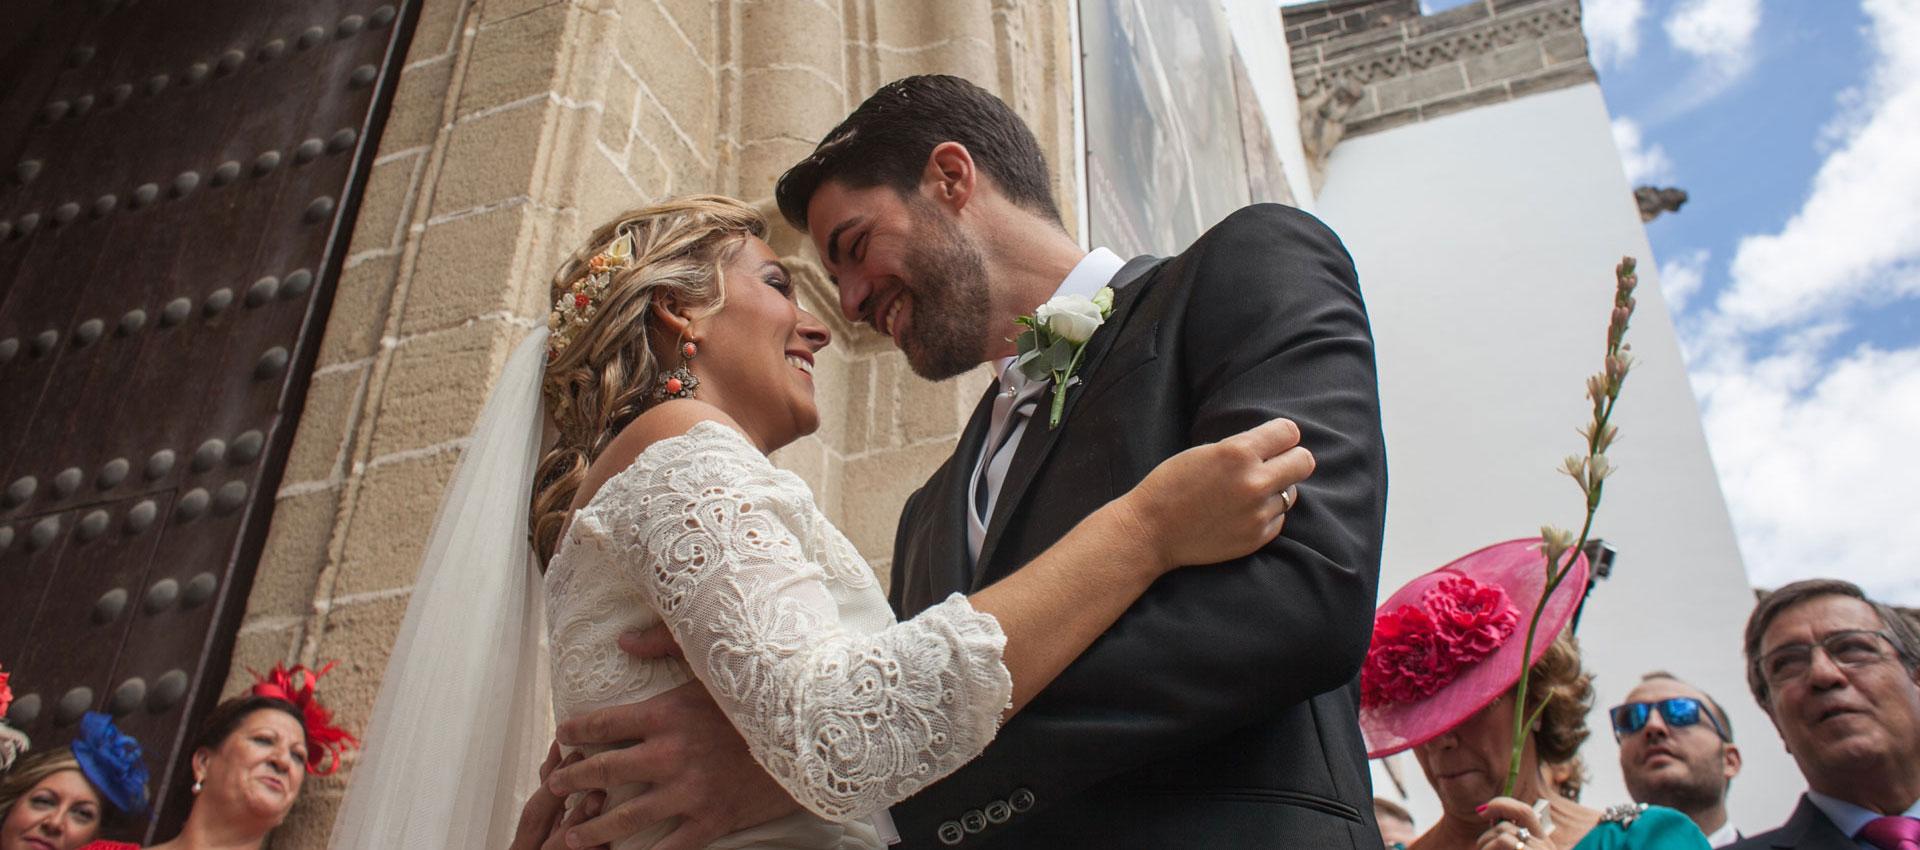 2 Back to the Wedding - video boda cadiz